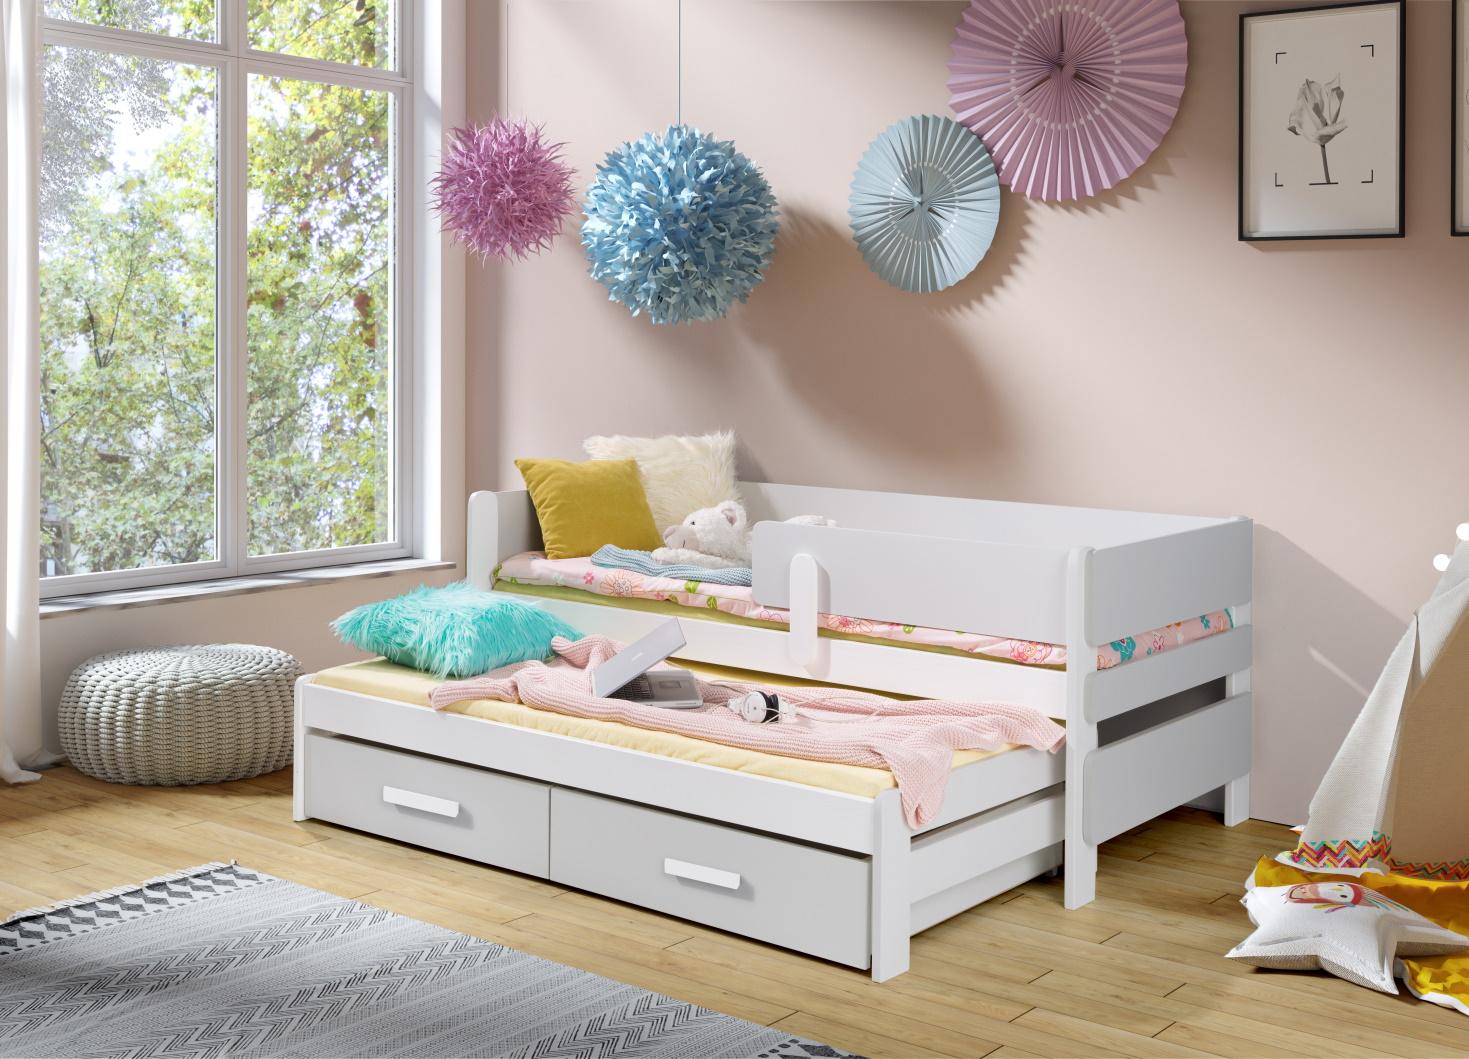 MebloBed Rozkládací postel Solano s úložným prostorem